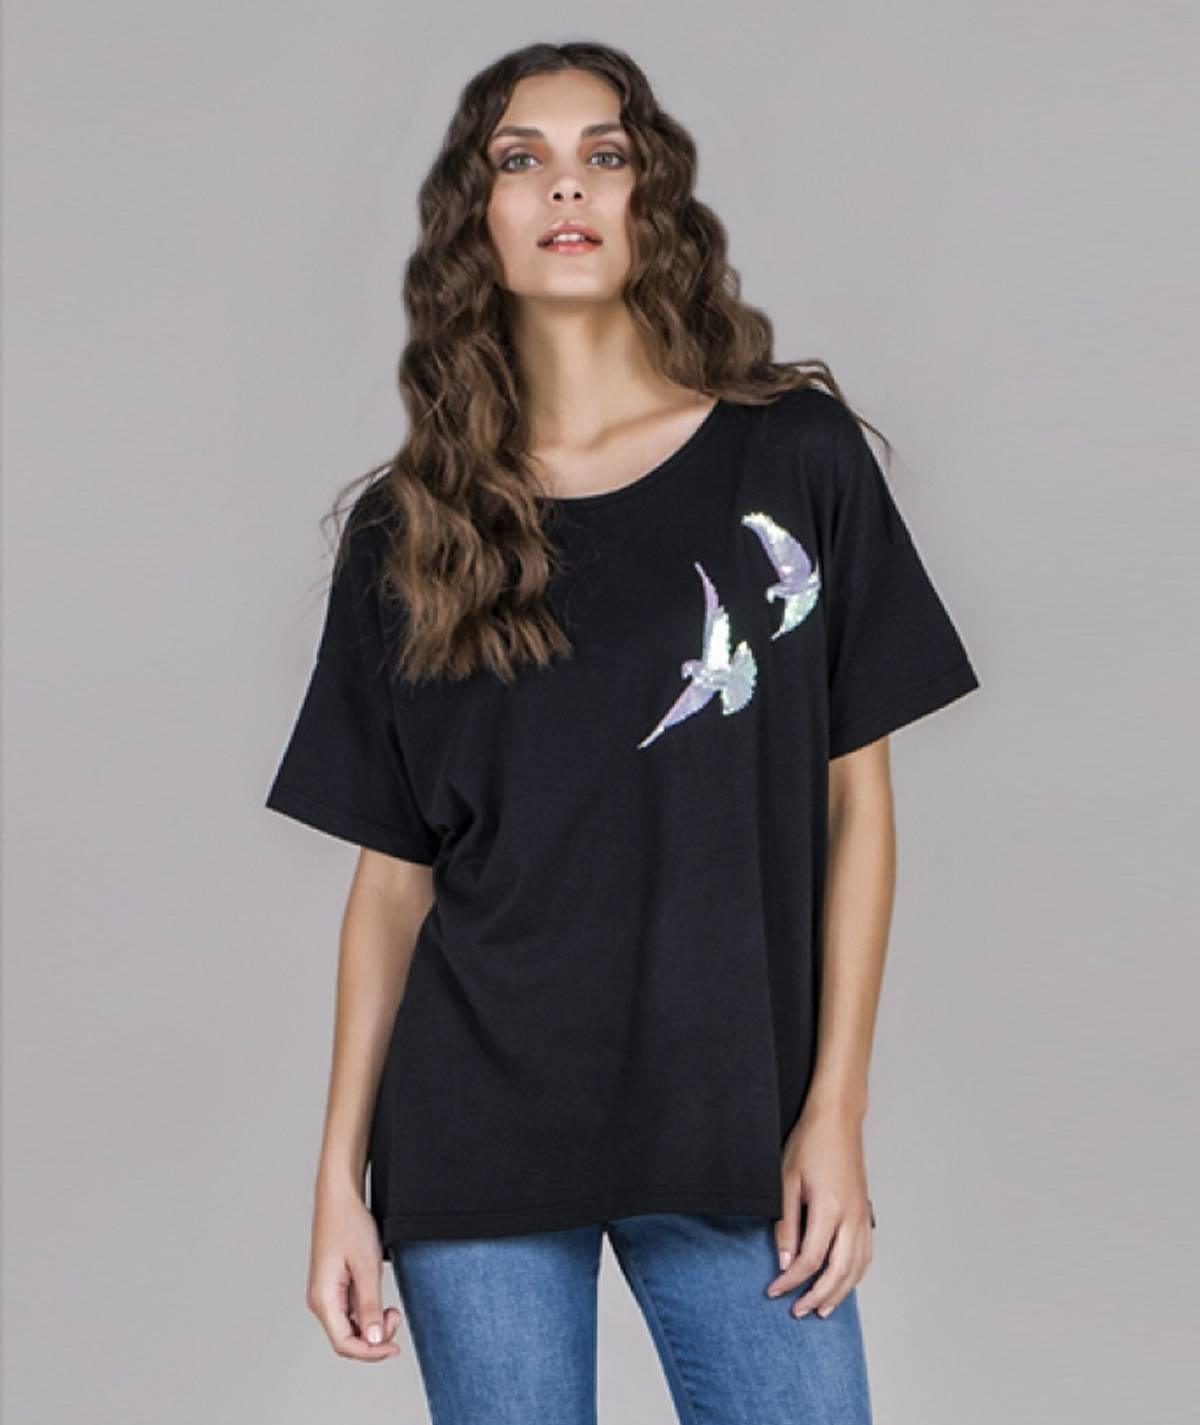 [CHIESSY] T-shirt pássaros